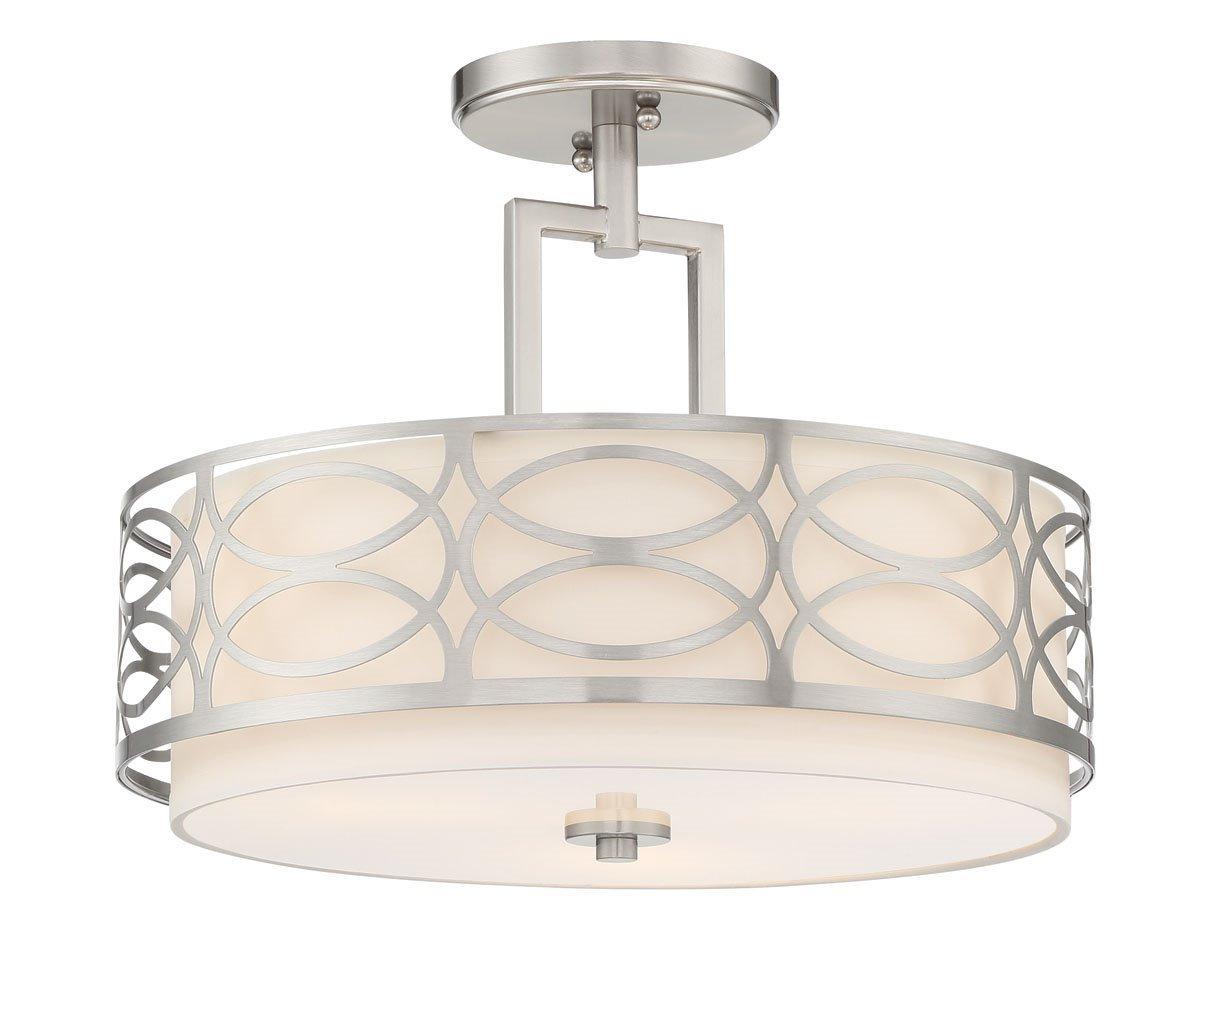 Kira home sienna 15 3 light semi flush mount ceiling light white fabric shade glass diffuser brushed nickel finish